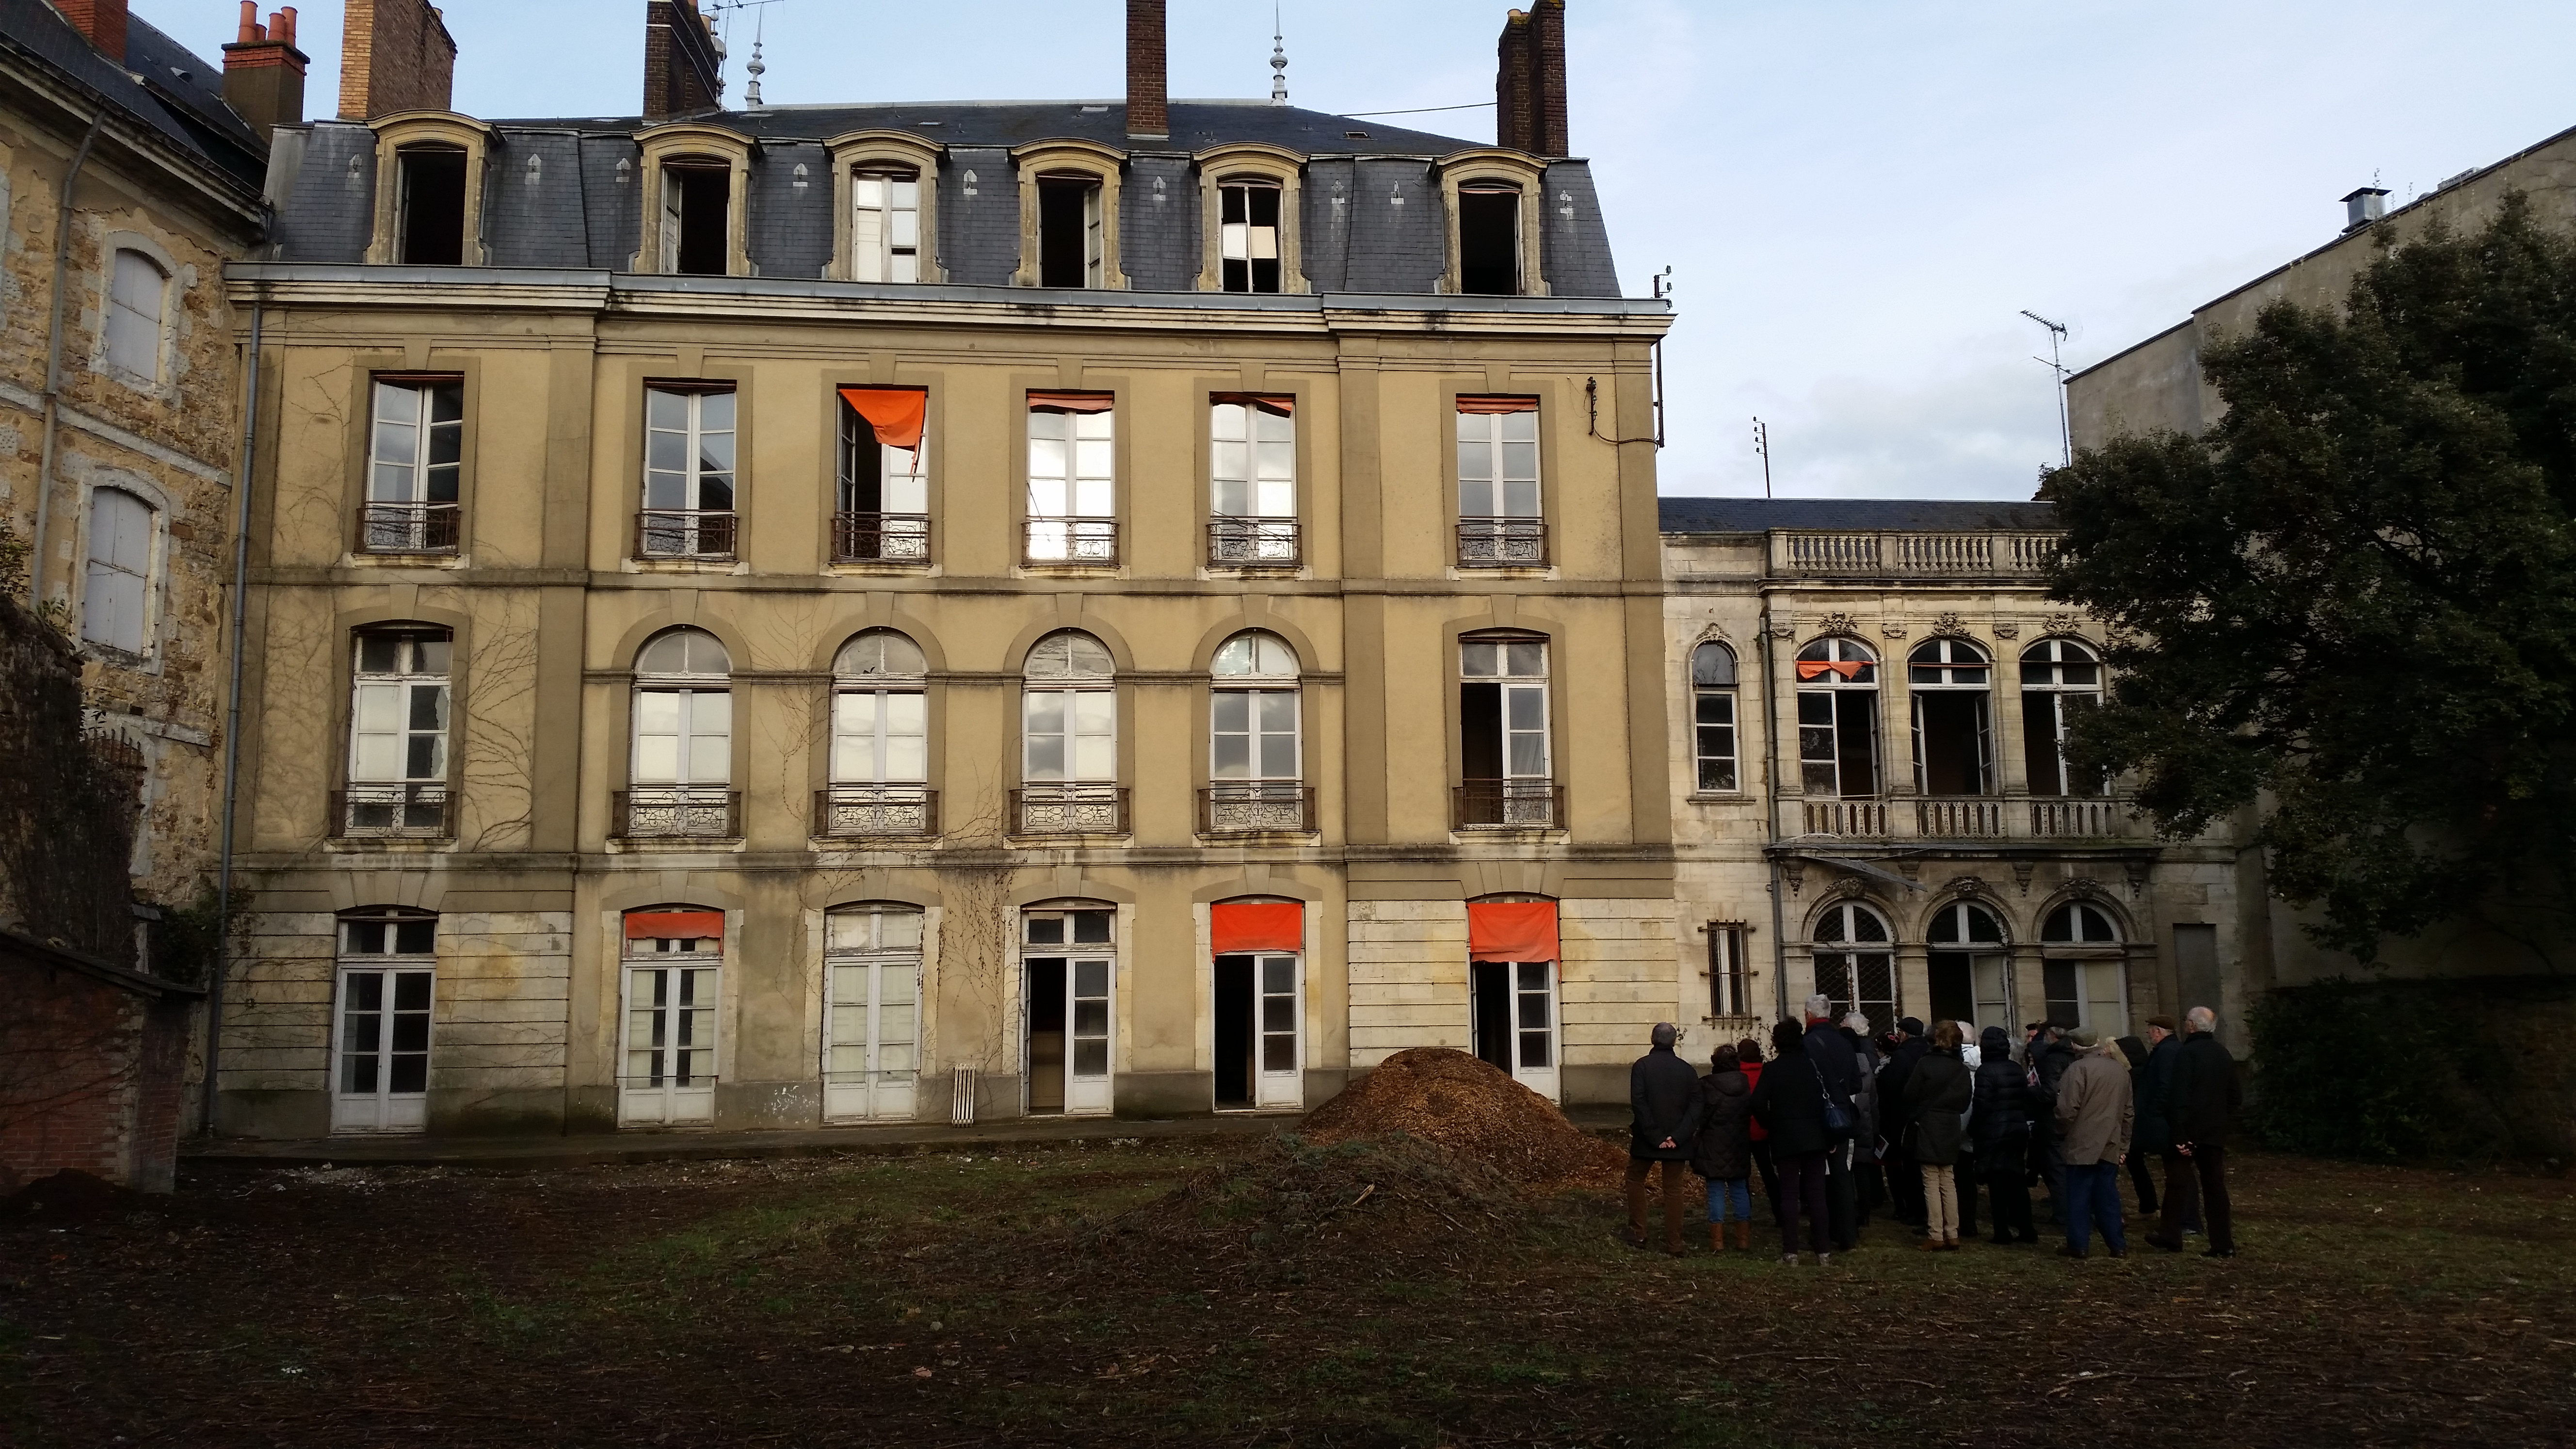 Le Mans - Hôtel Leprince - 23 février 2017 - Vue 07 - (Christophe Menu)